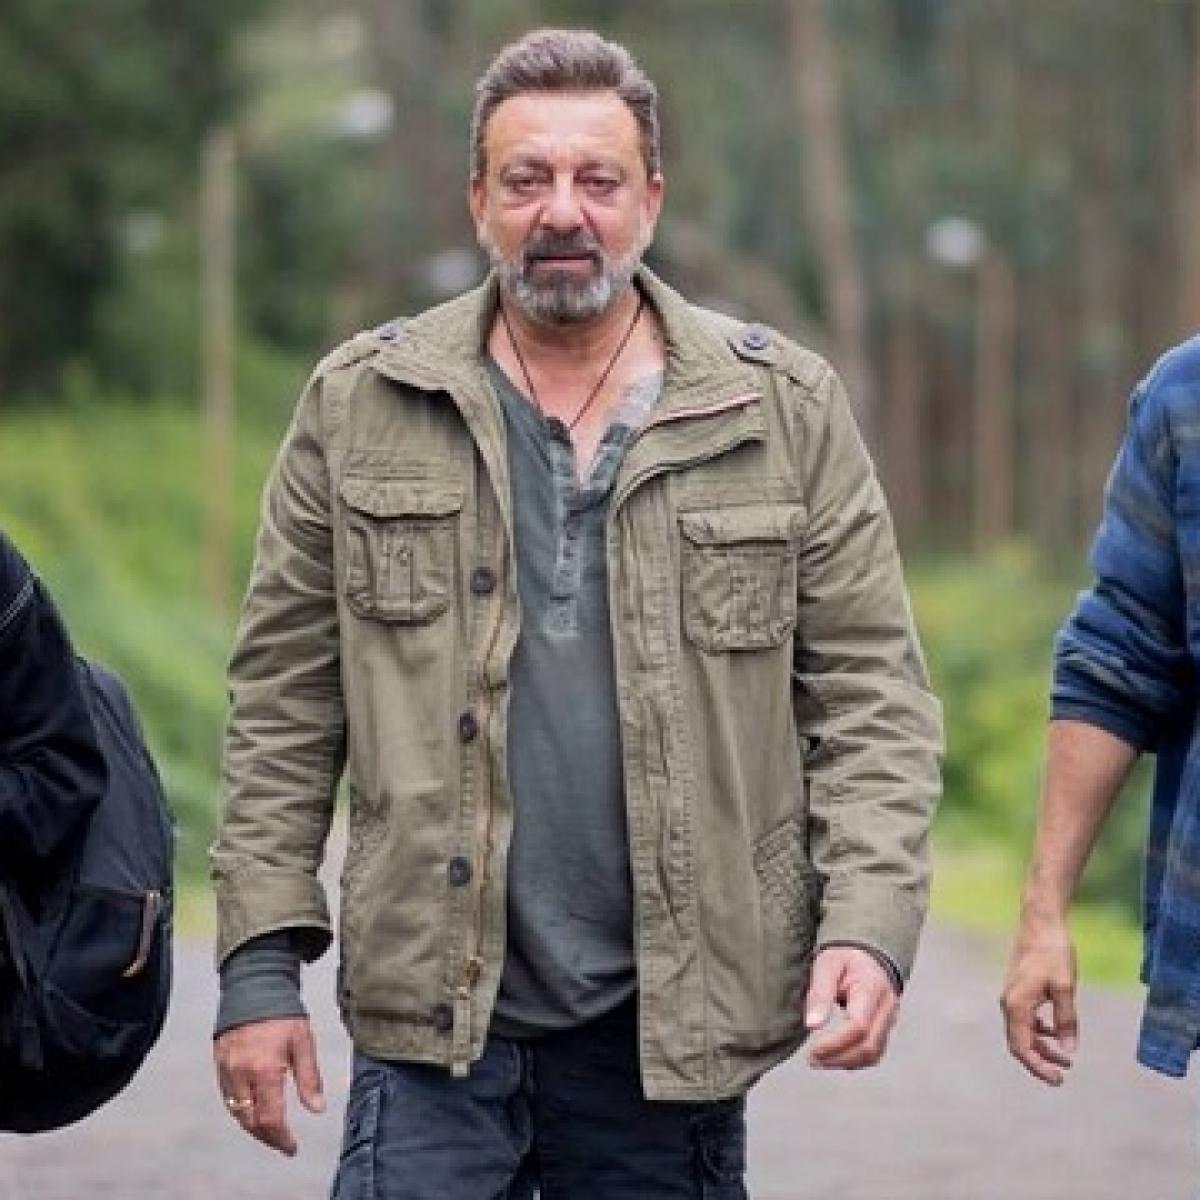 Sadak 2 movie review: Impressive performances, gripping narrative